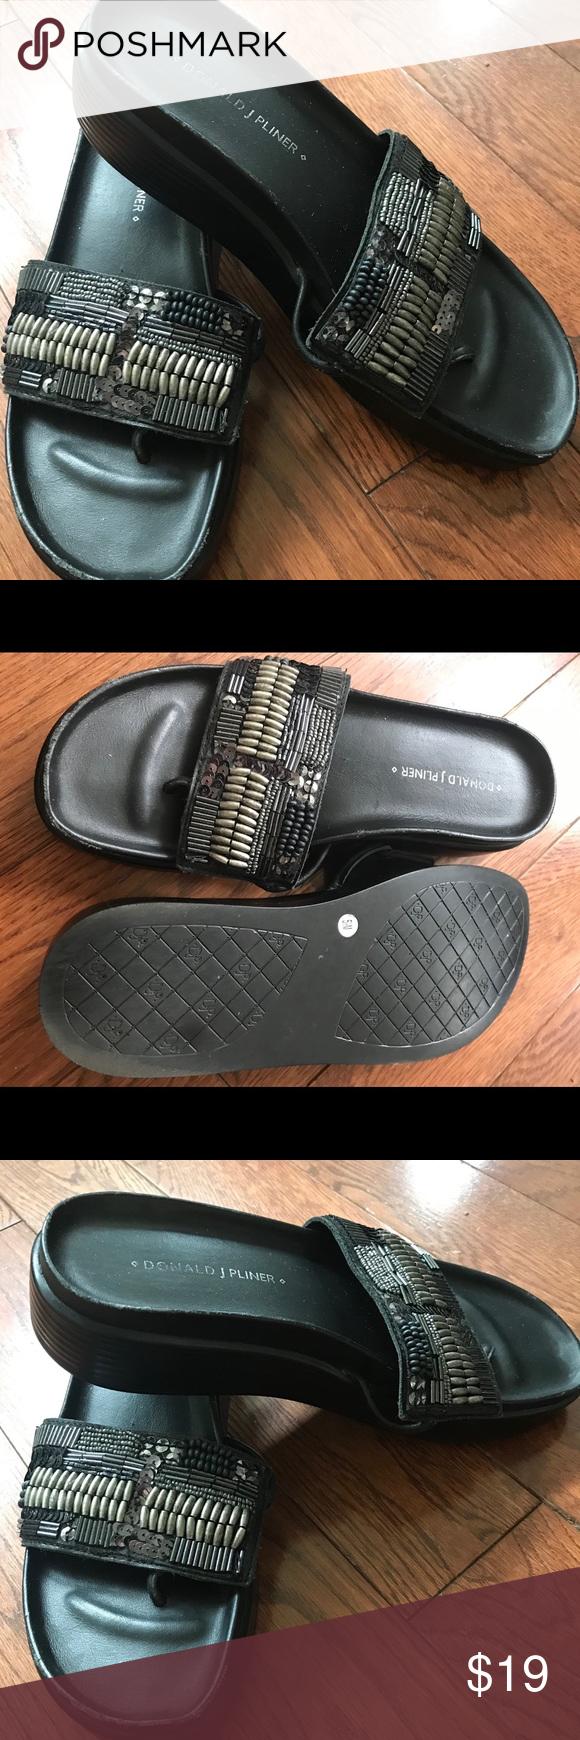 a1ec16612f Donald J Pliner Fifi Slide Sandals Blk Beaded 5.5 Donald J Pliner Fifi  platforms slides sandals, black with beads, size is 5.5, excellent  condition Donald ...